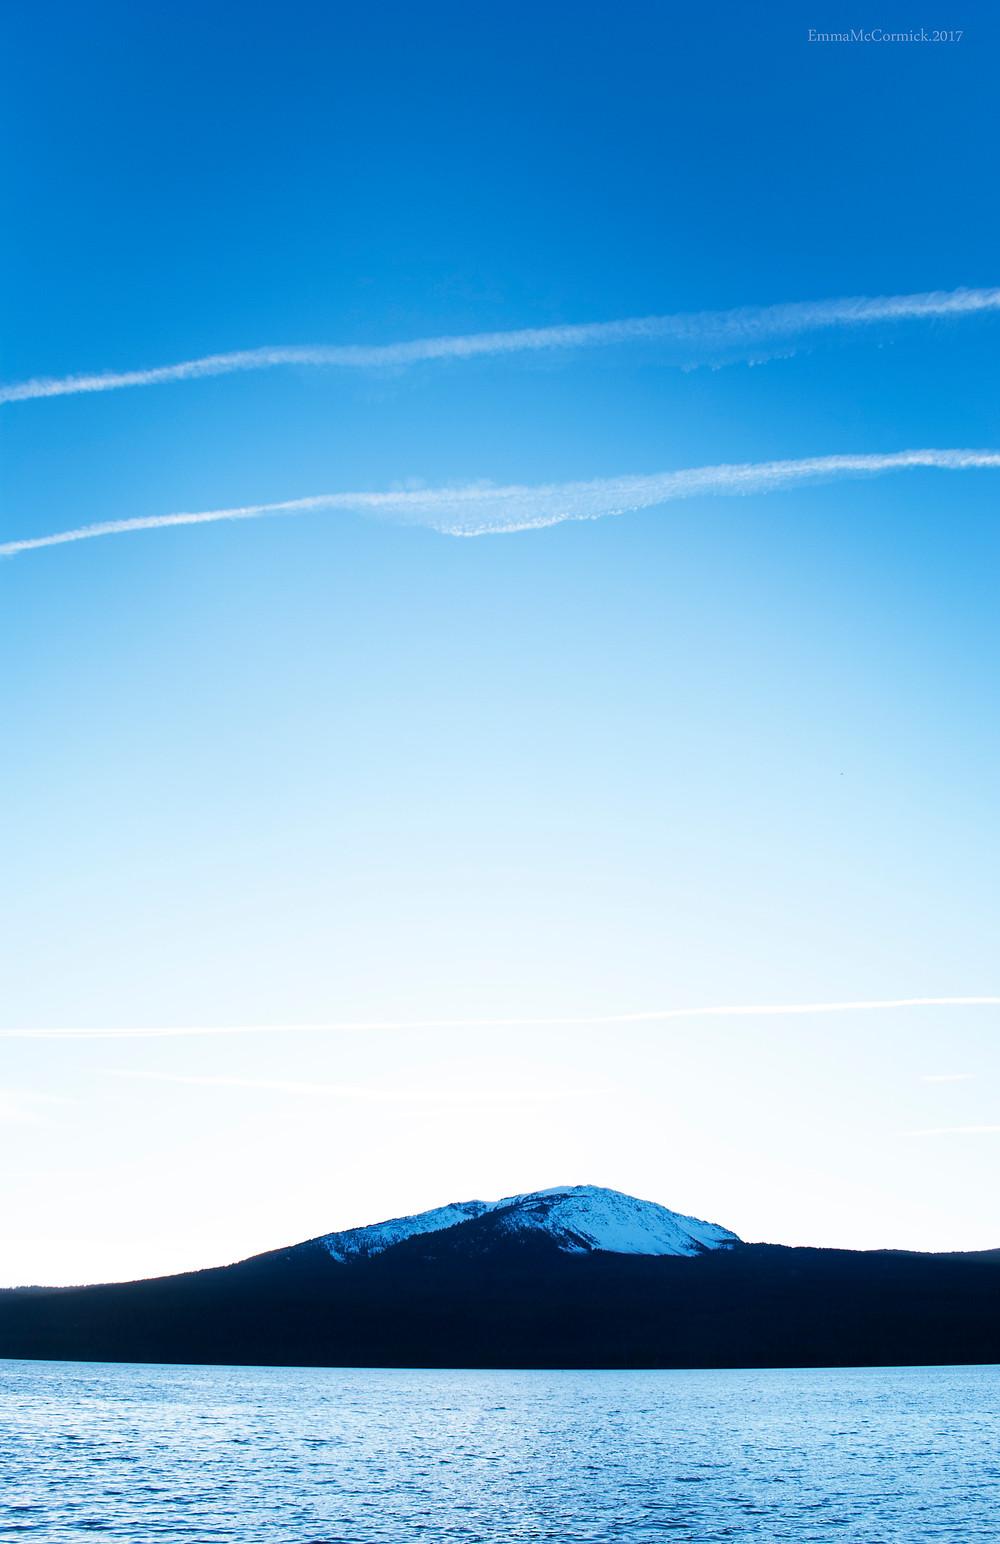 Blue evening sky, Lake and snow capped mountain. Diamond Lake.